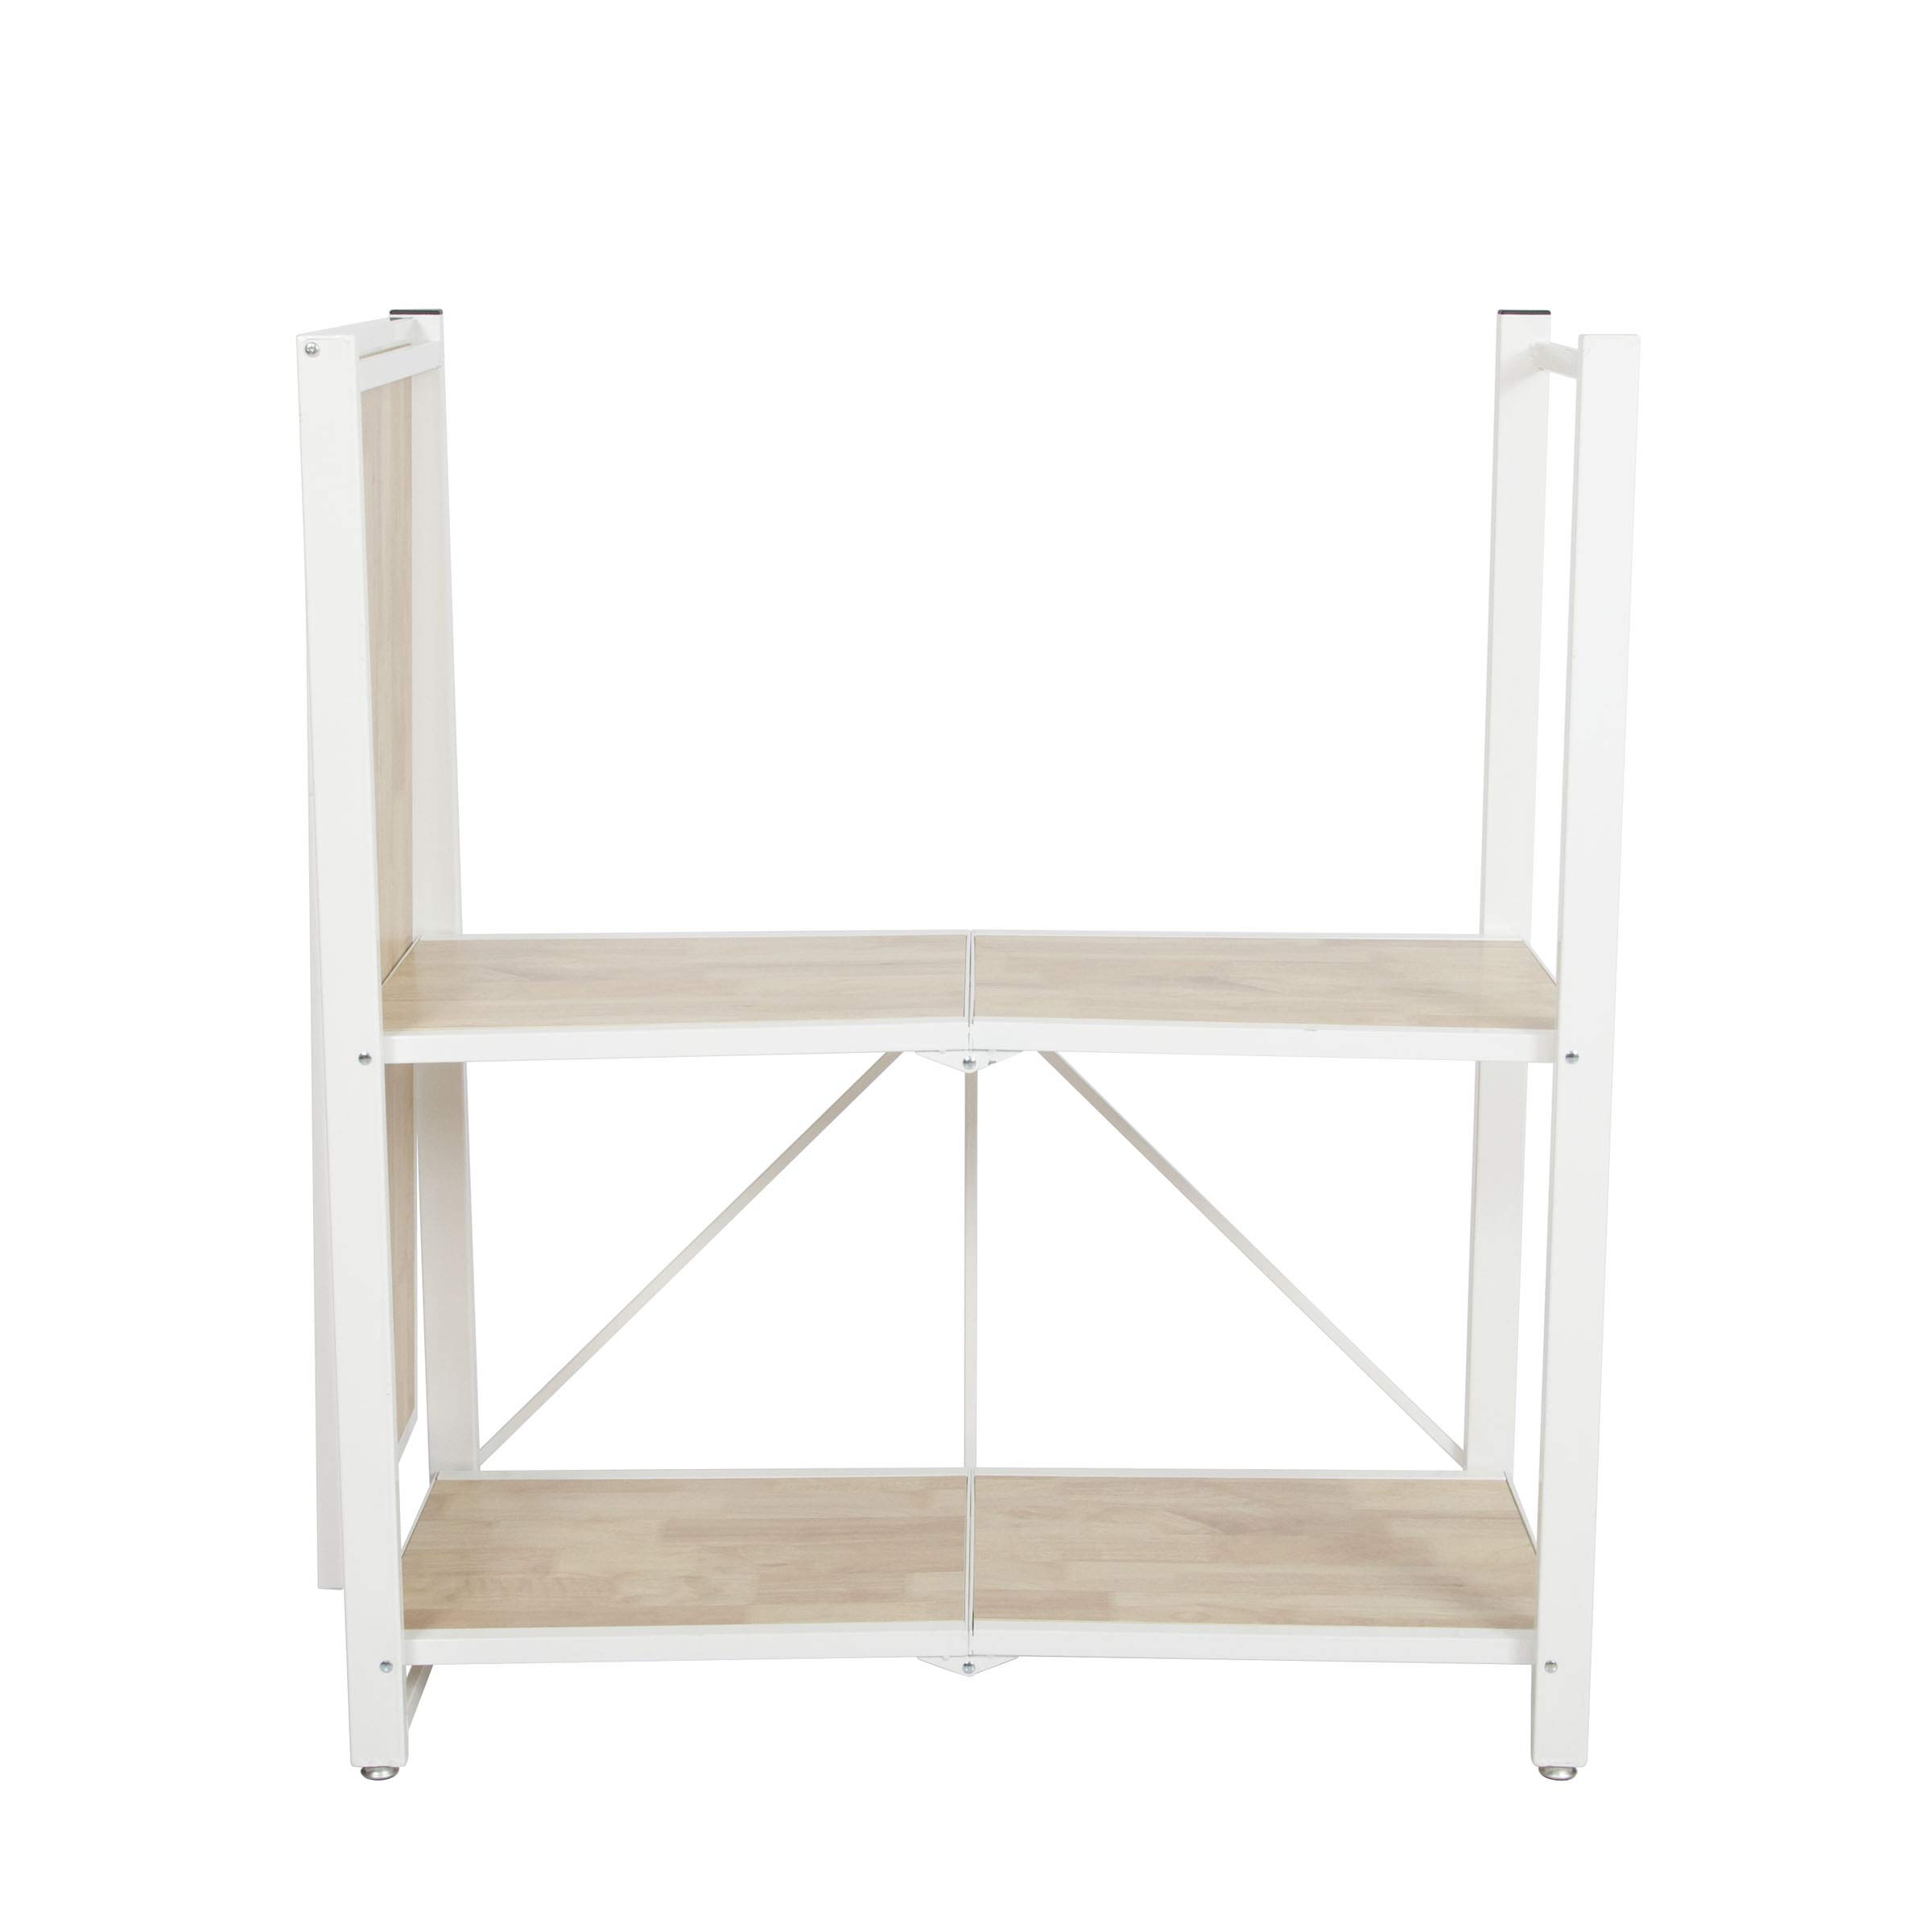 Origami Folding 4-Tier Heavy Duty Steel Baker's Rack with Wood Shelf, White by Origami (Image #7)